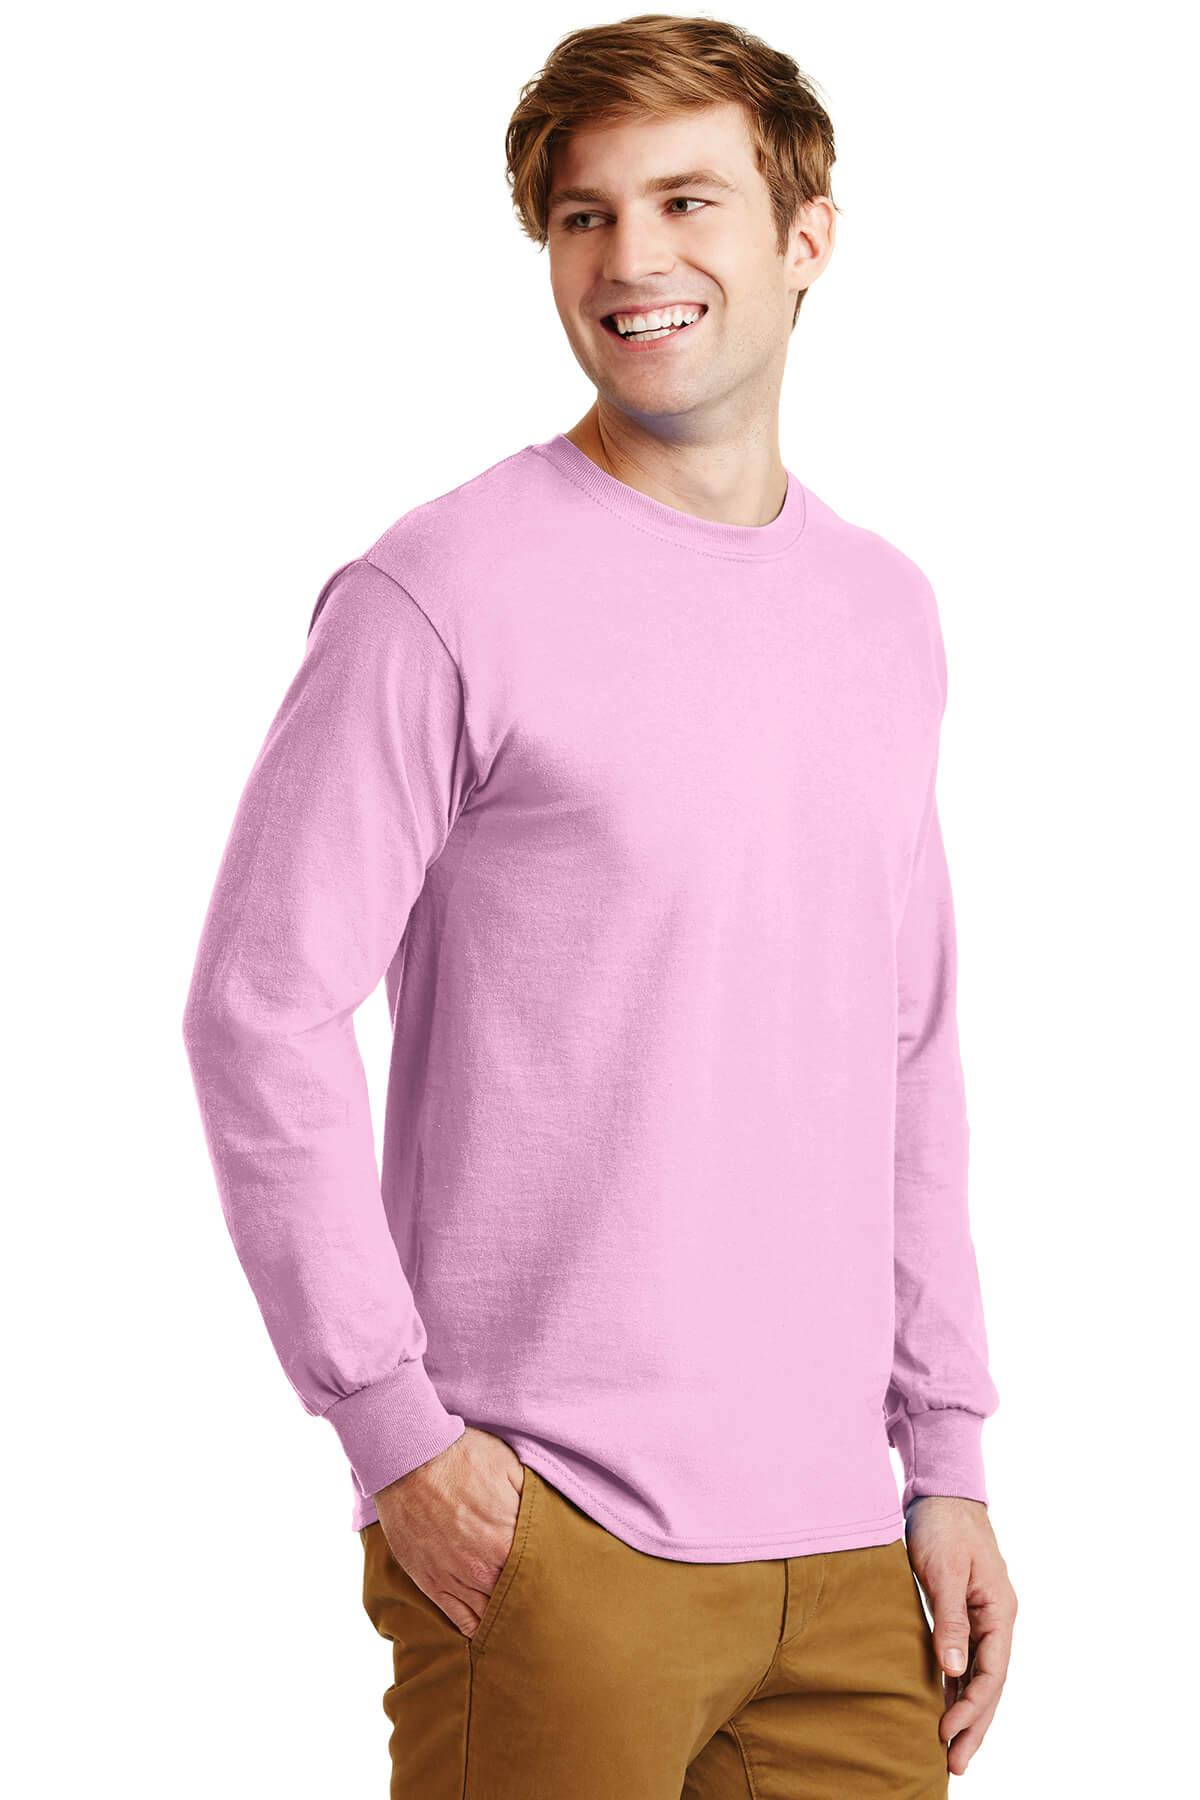 g2400-light-pink-4